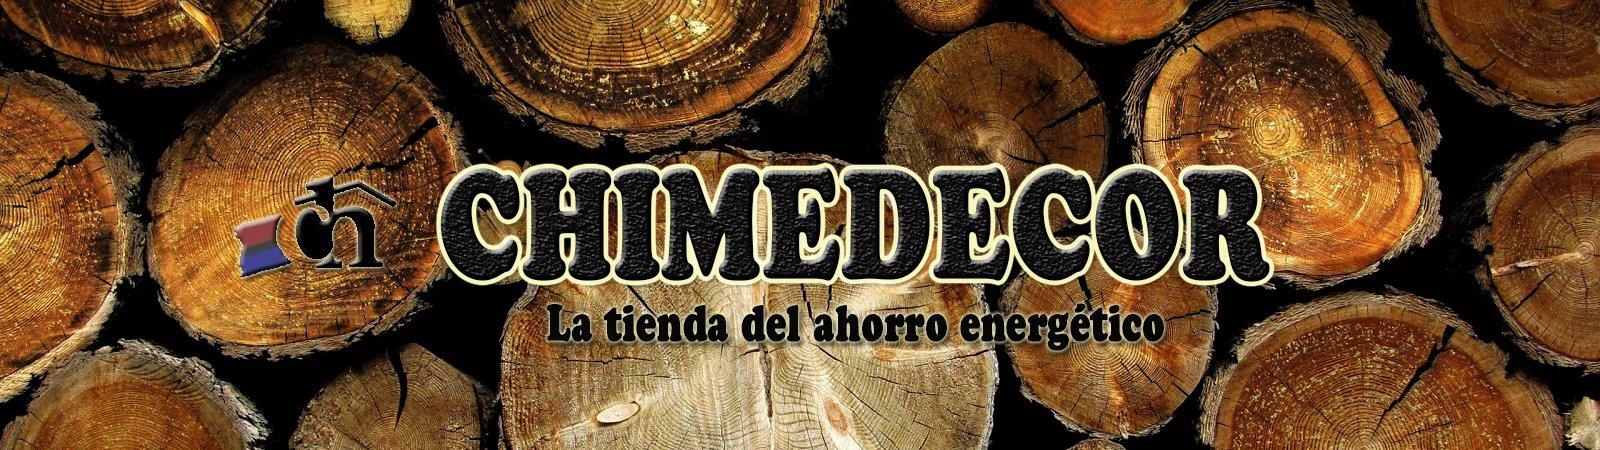 chimeneas en Colmenar Viejo, chimeneas en soto del real